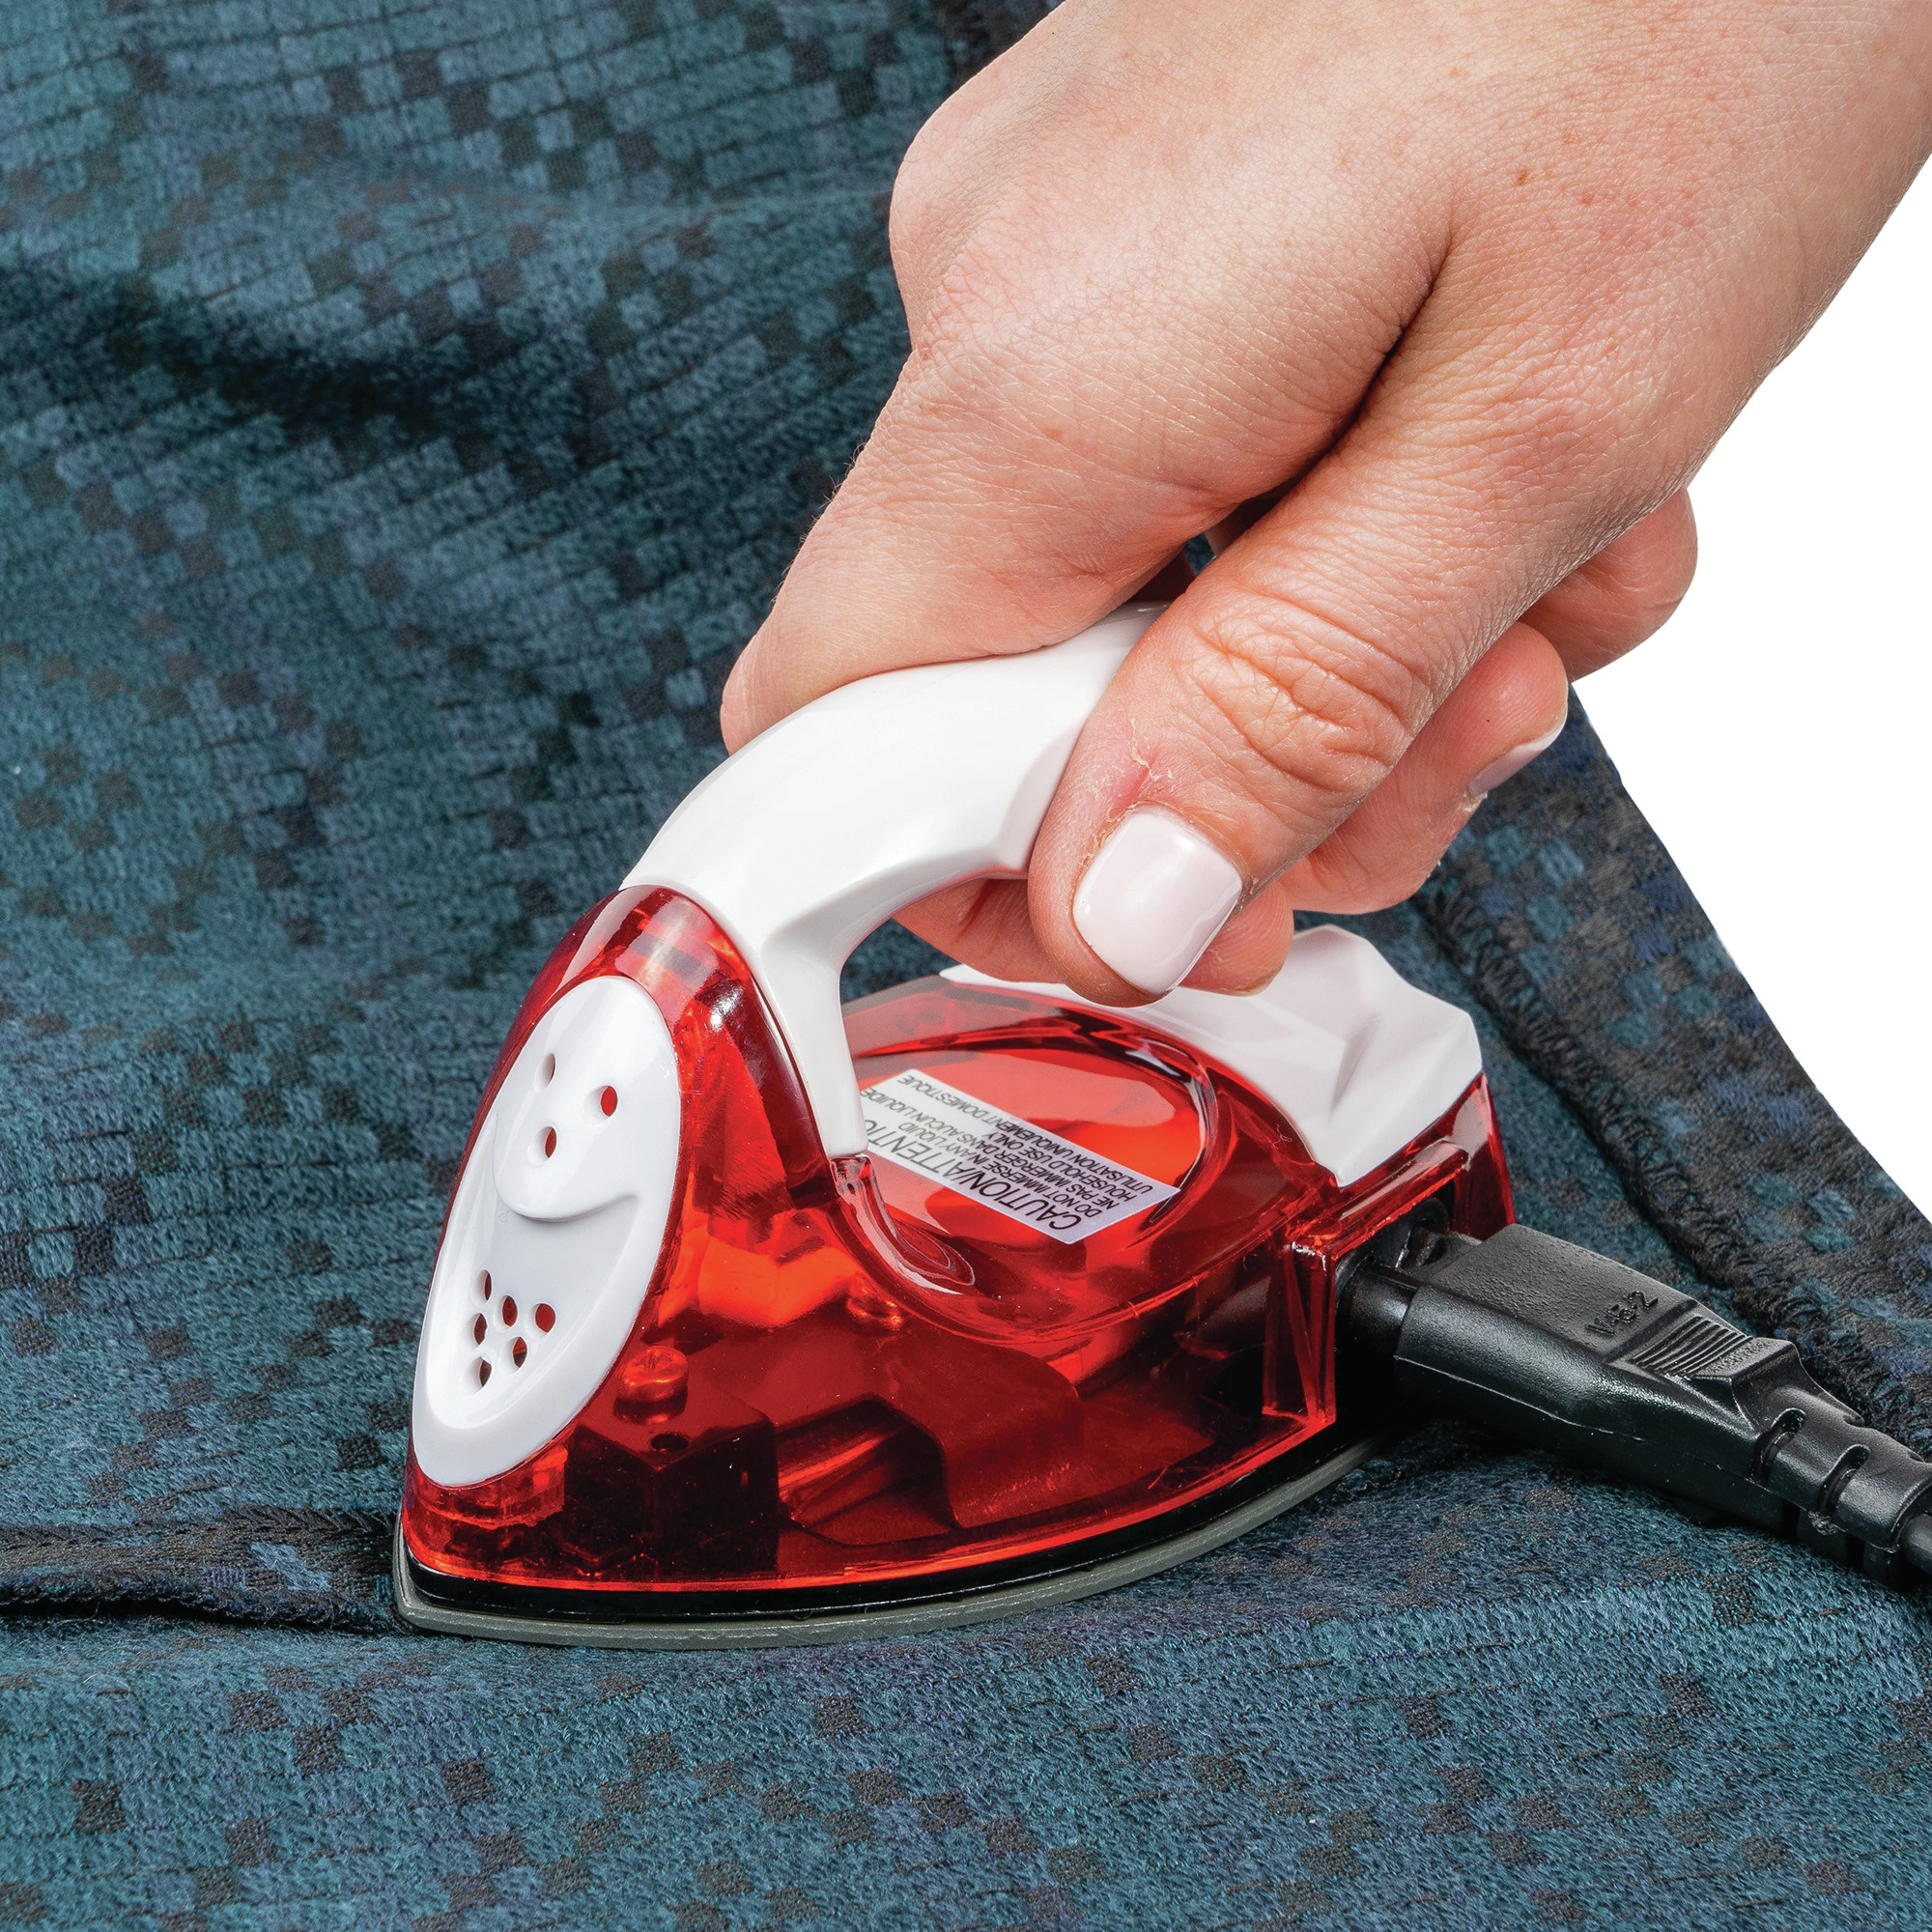 Dyno Handy Press Mini Iron-